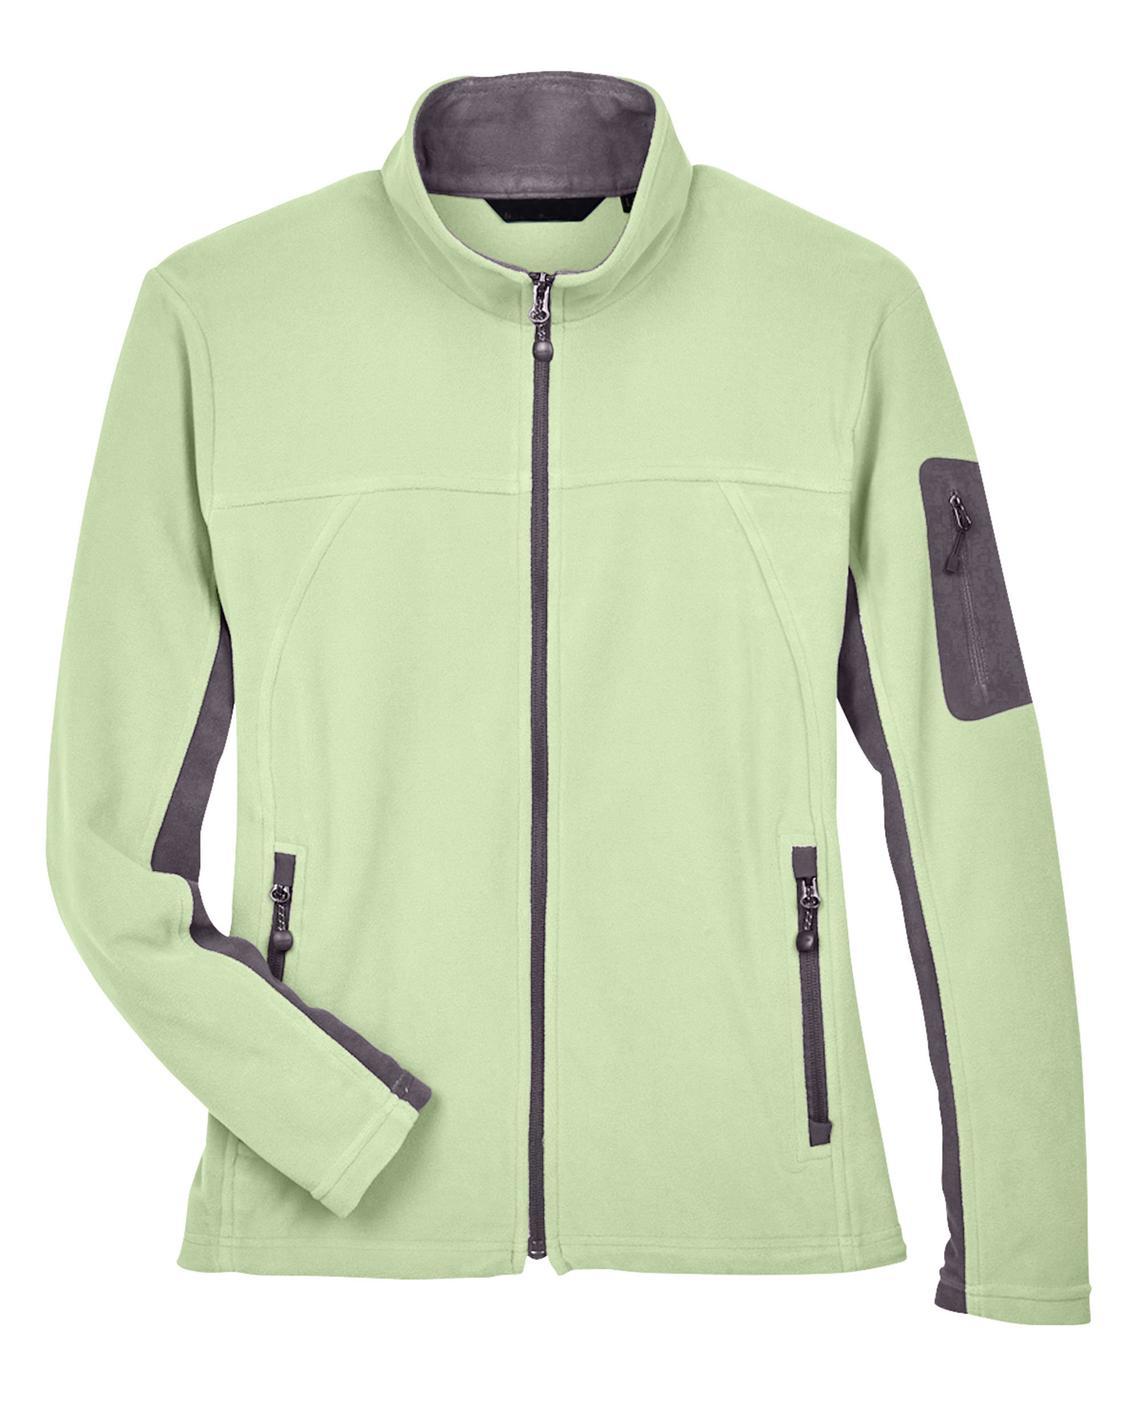 VAD-Wear®-Ladies-Micro-Fleece-LVAD-Jacket-3-2.jpg